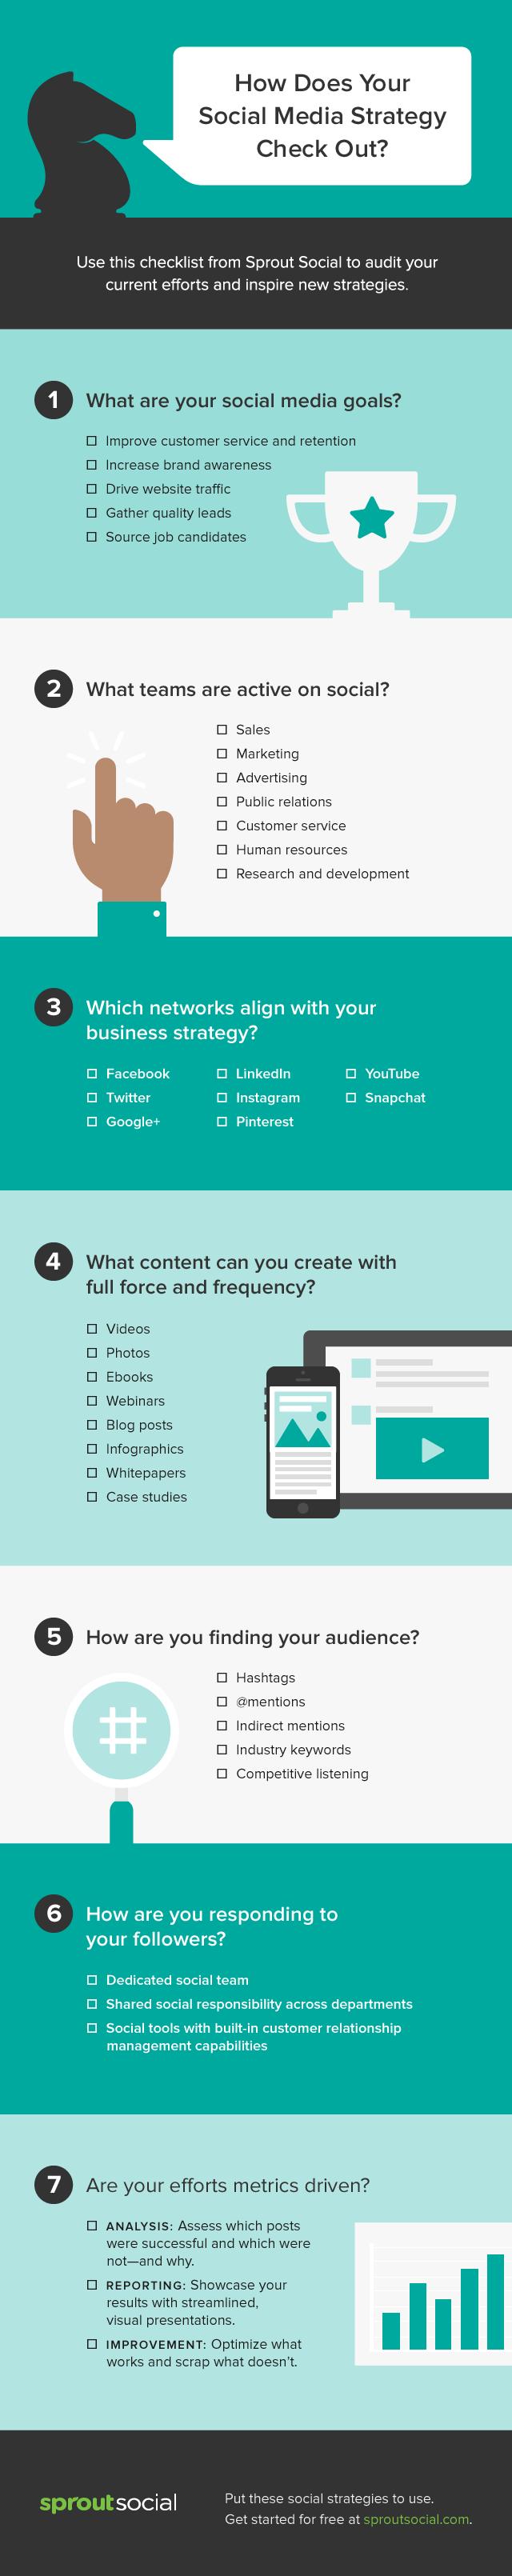 social media marketing strategy checklist